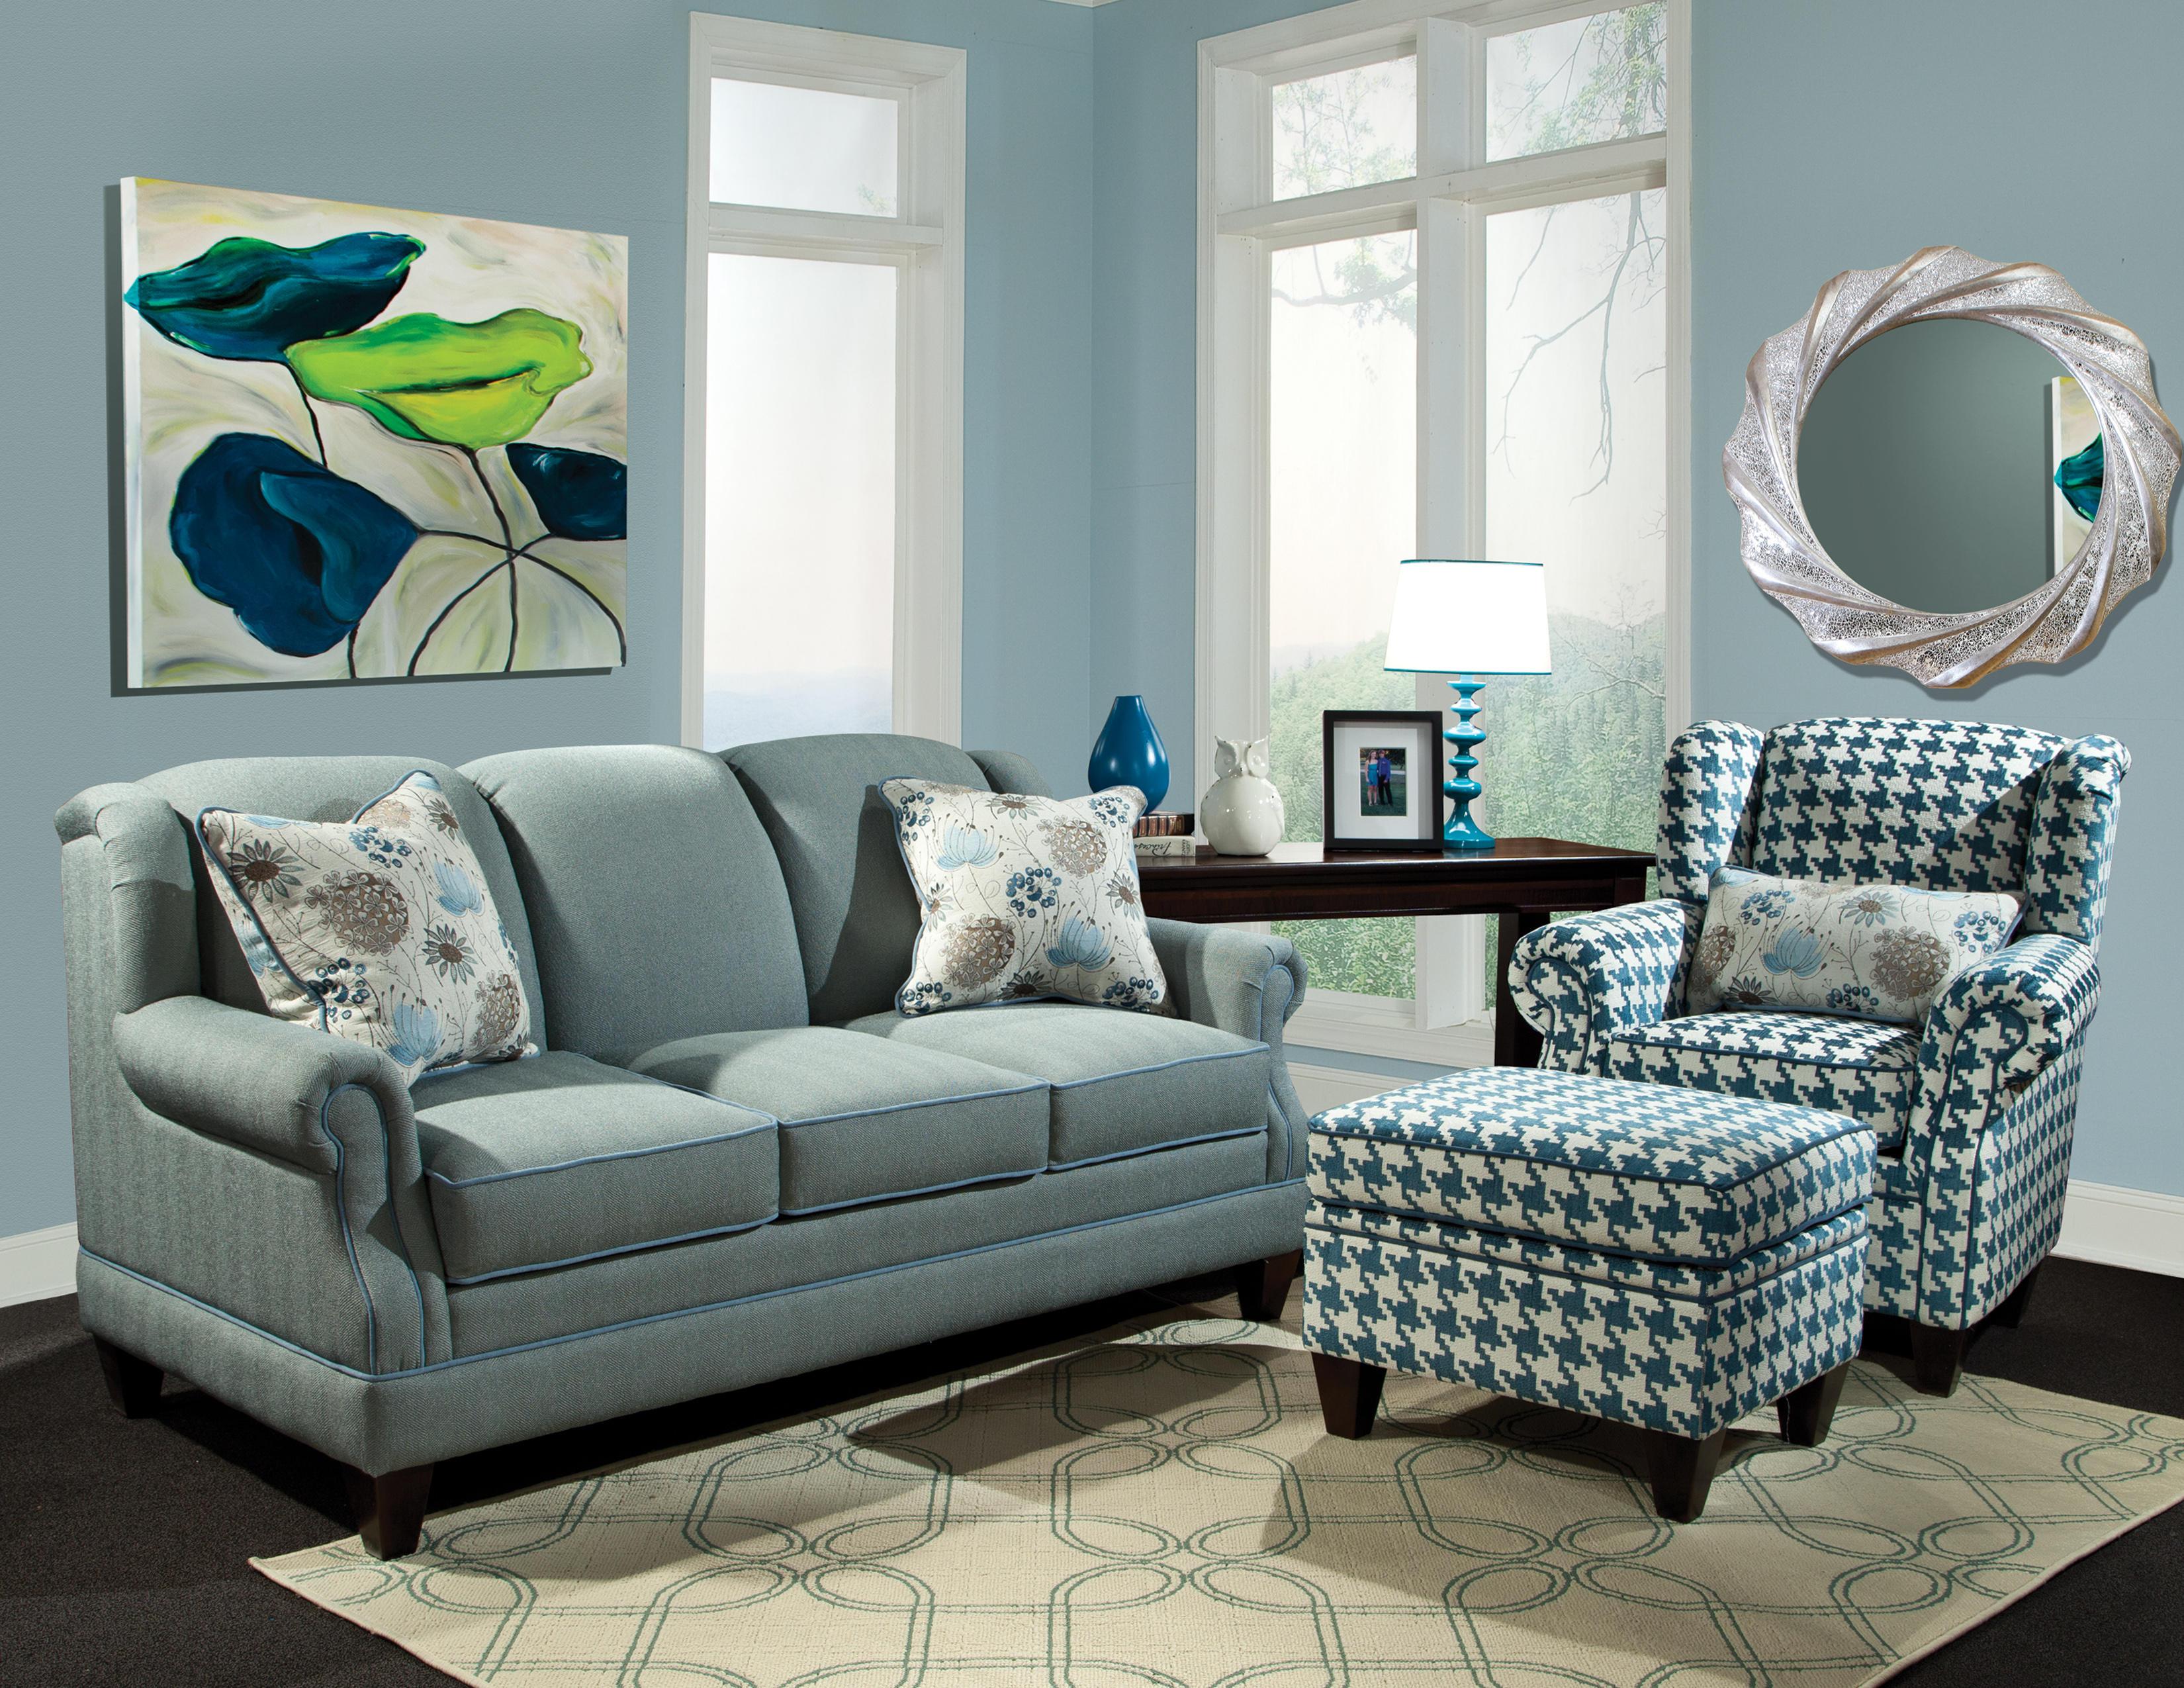 Shimocks Furniture image 1